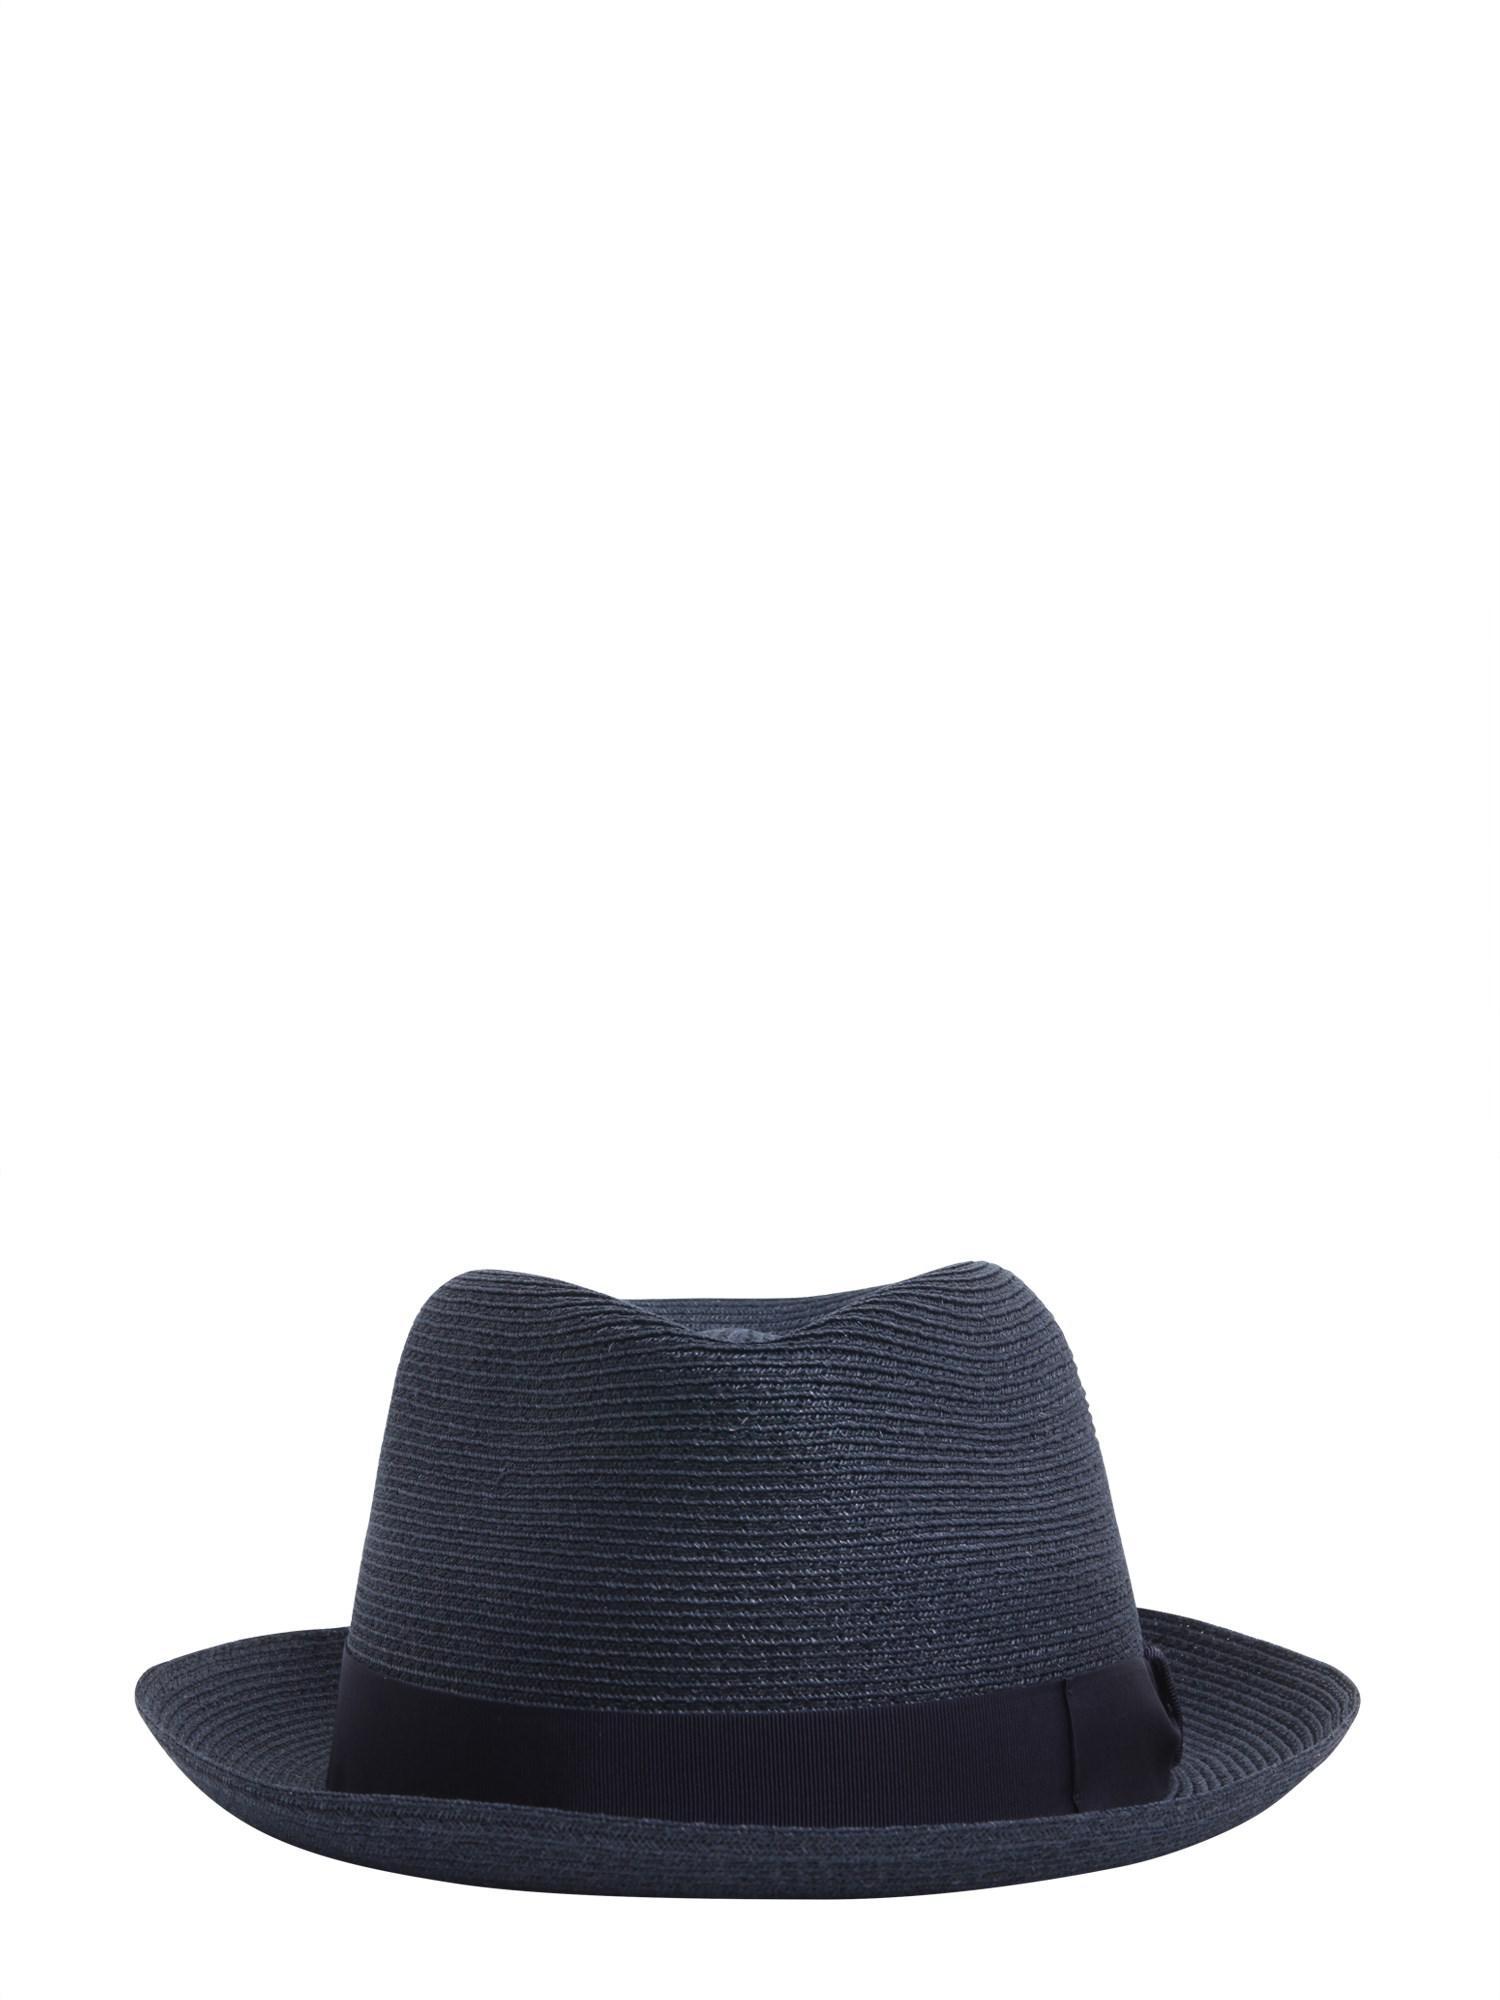 Lyst - Borsalino Cappello Panama Tesa Piccola In Canapa in Blue for Men ac26298c597d